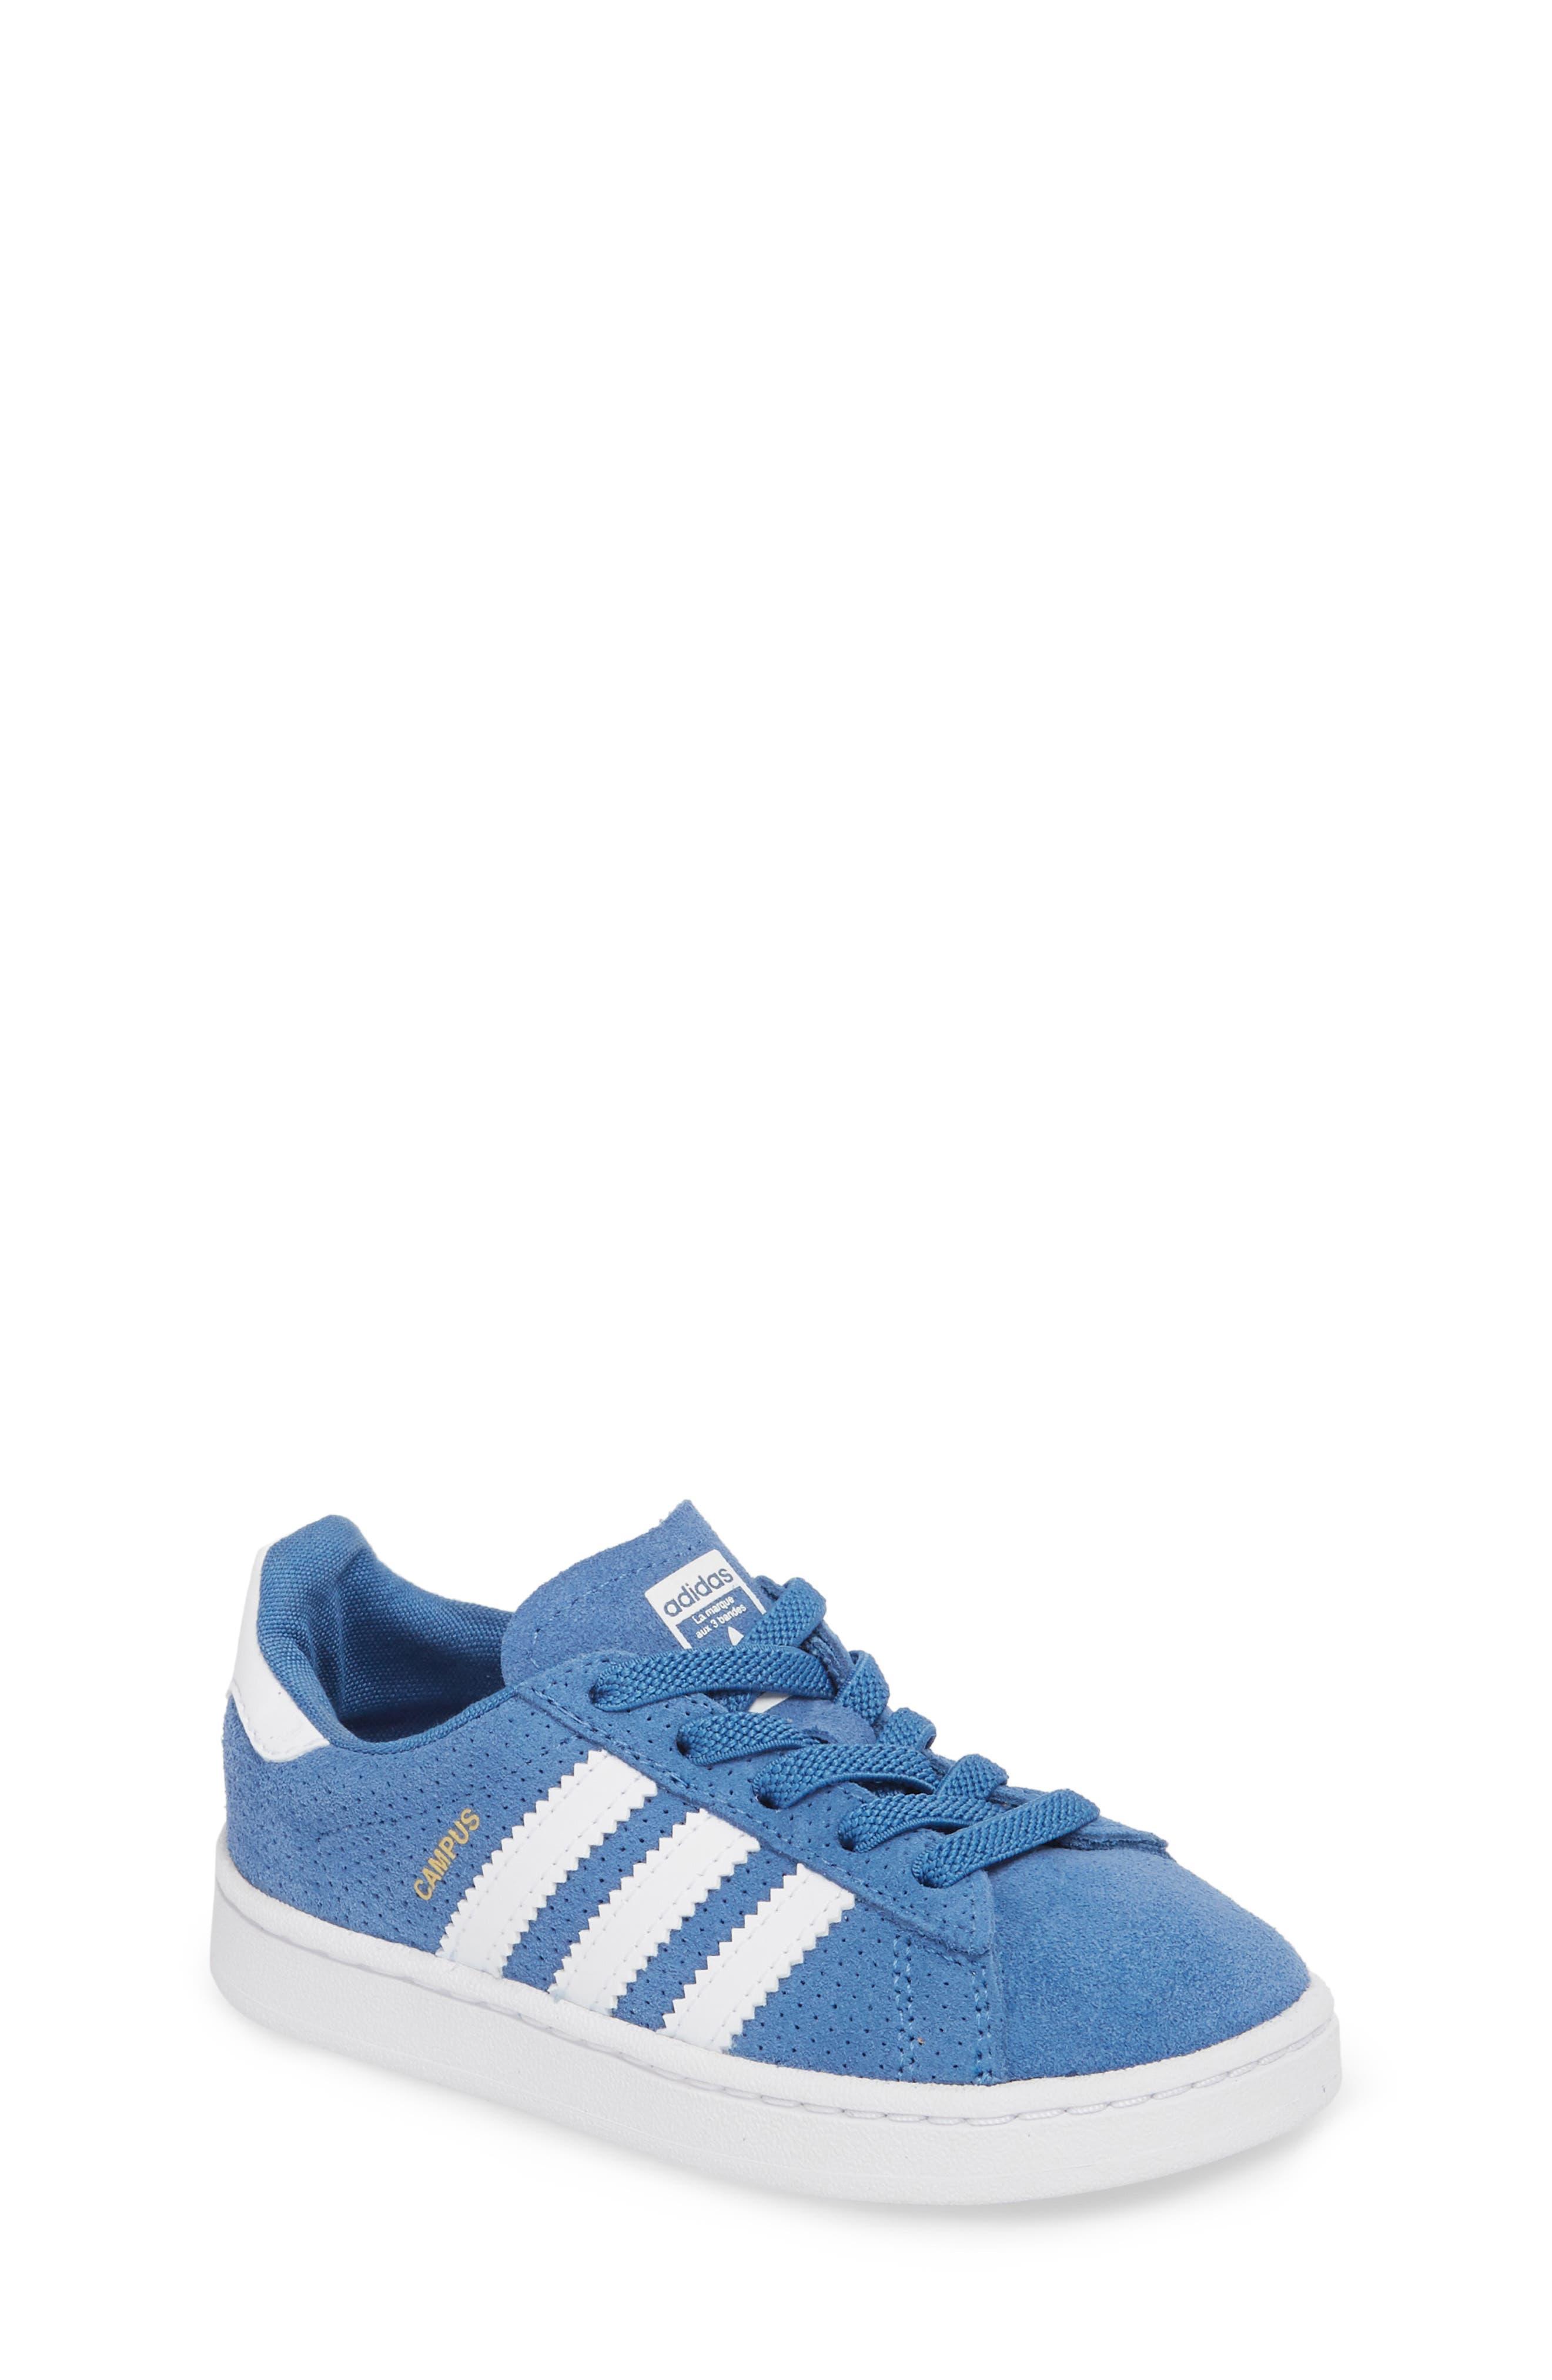 Campus J Sneaker,                             Main thumbnail 1, color,                             Trace Royal / White / White